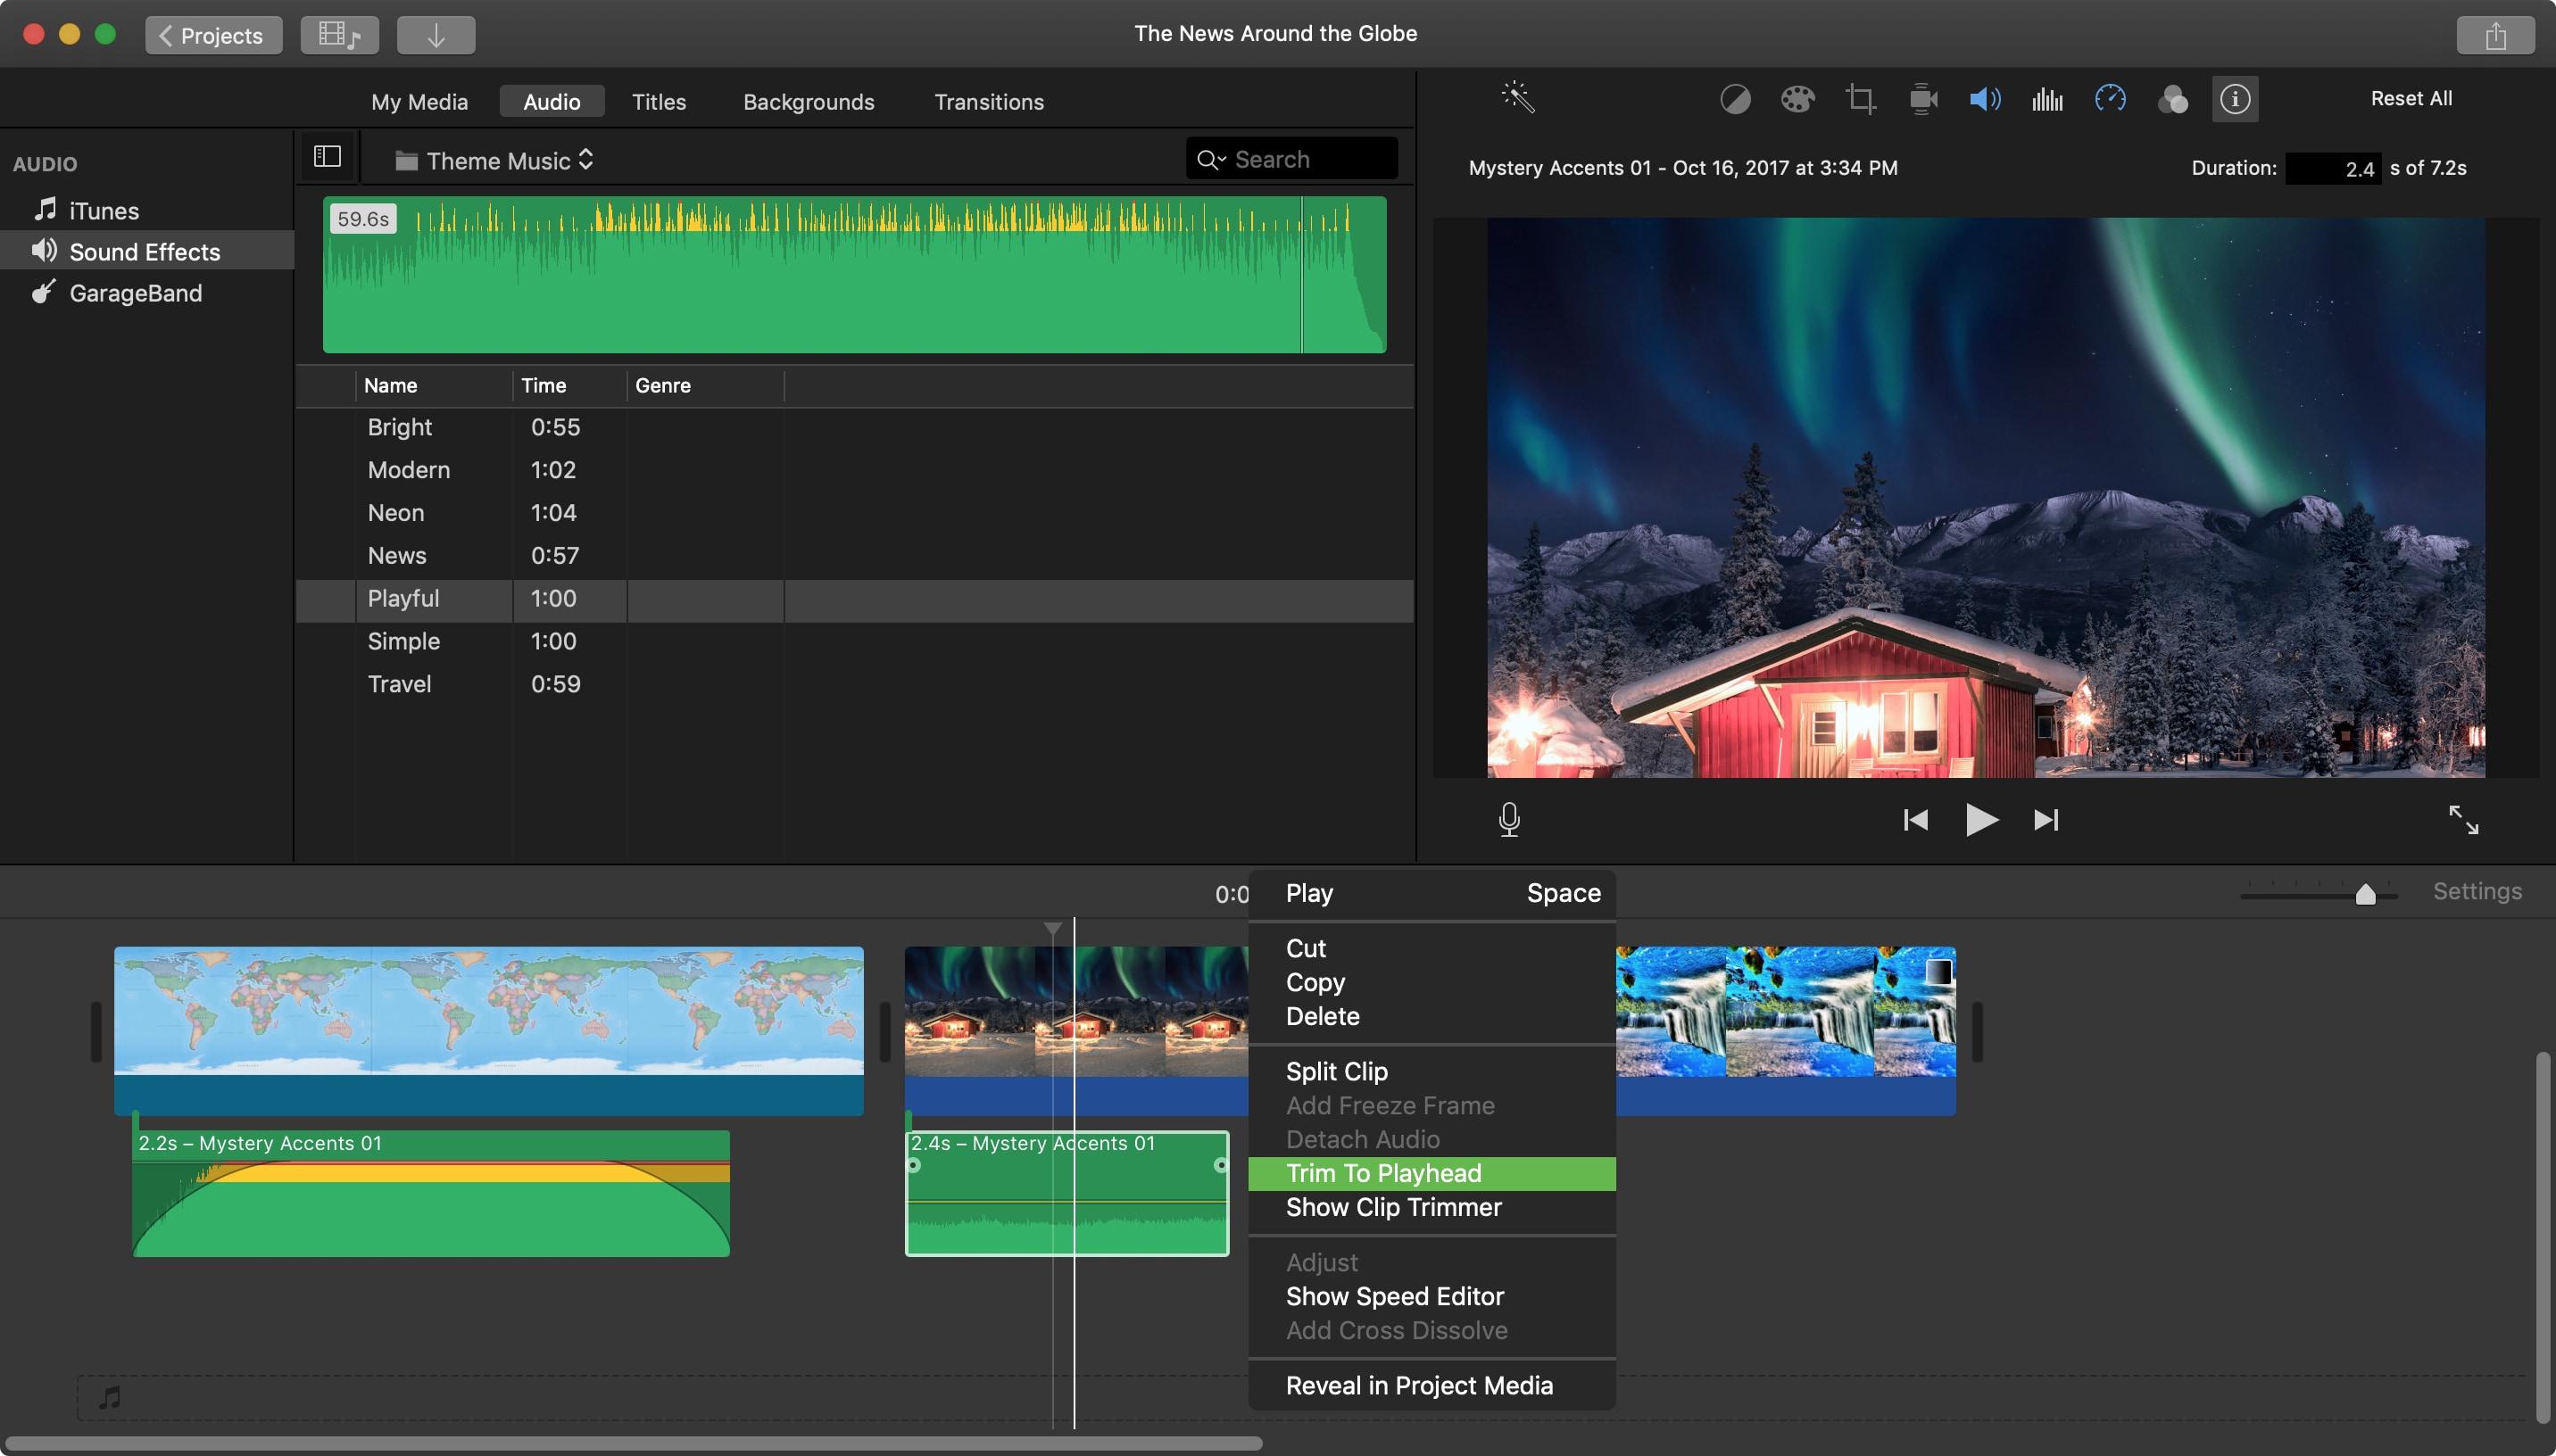 Trim to Playhead Audio Clip iMovie Mac